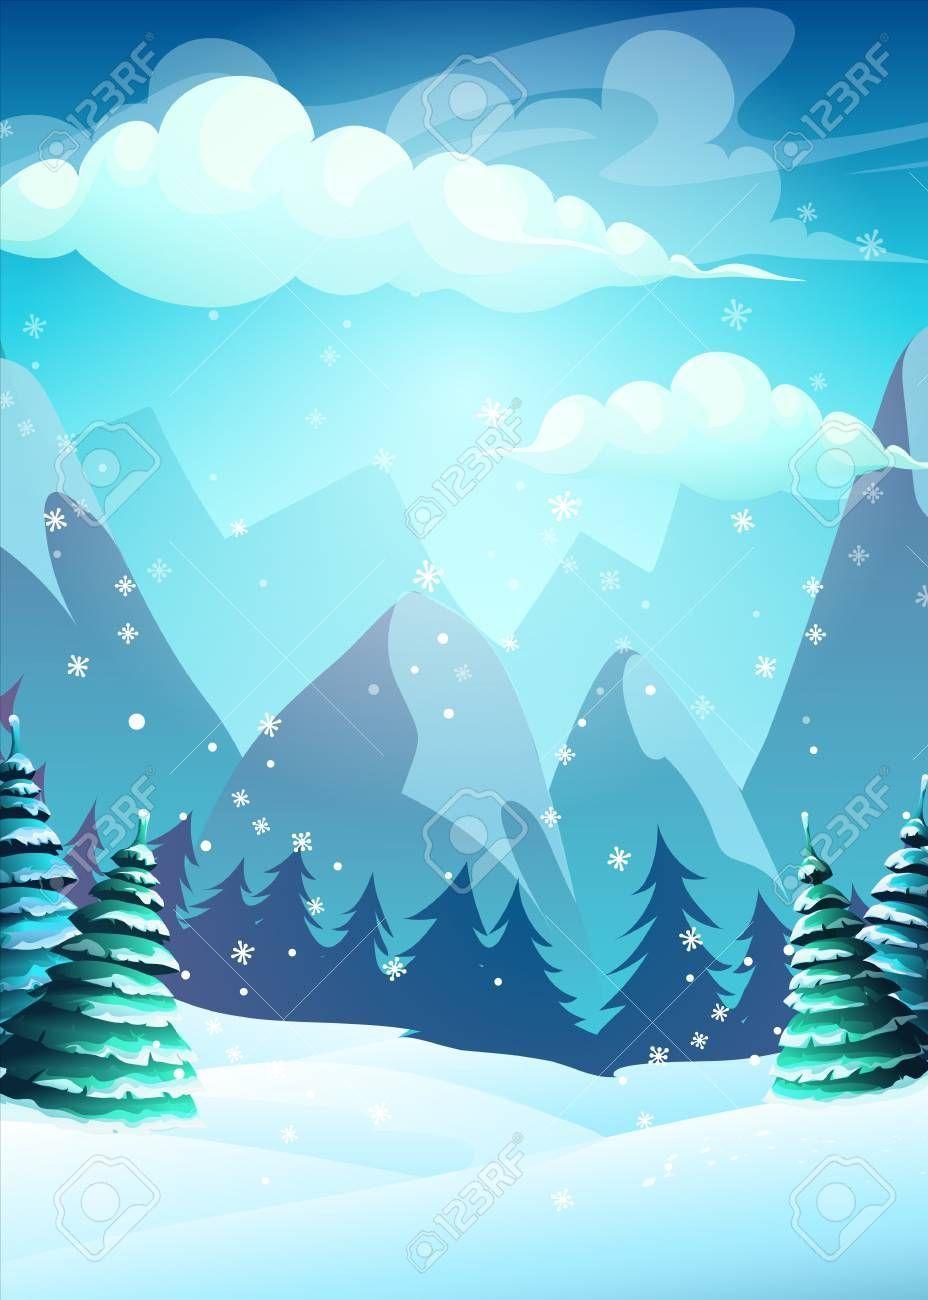 Vector Illustration Cartoon Winter Landscape For Web Video Games User Interfa In 2020 Christmas Card Illustration Vector Illustration Winter Illustration